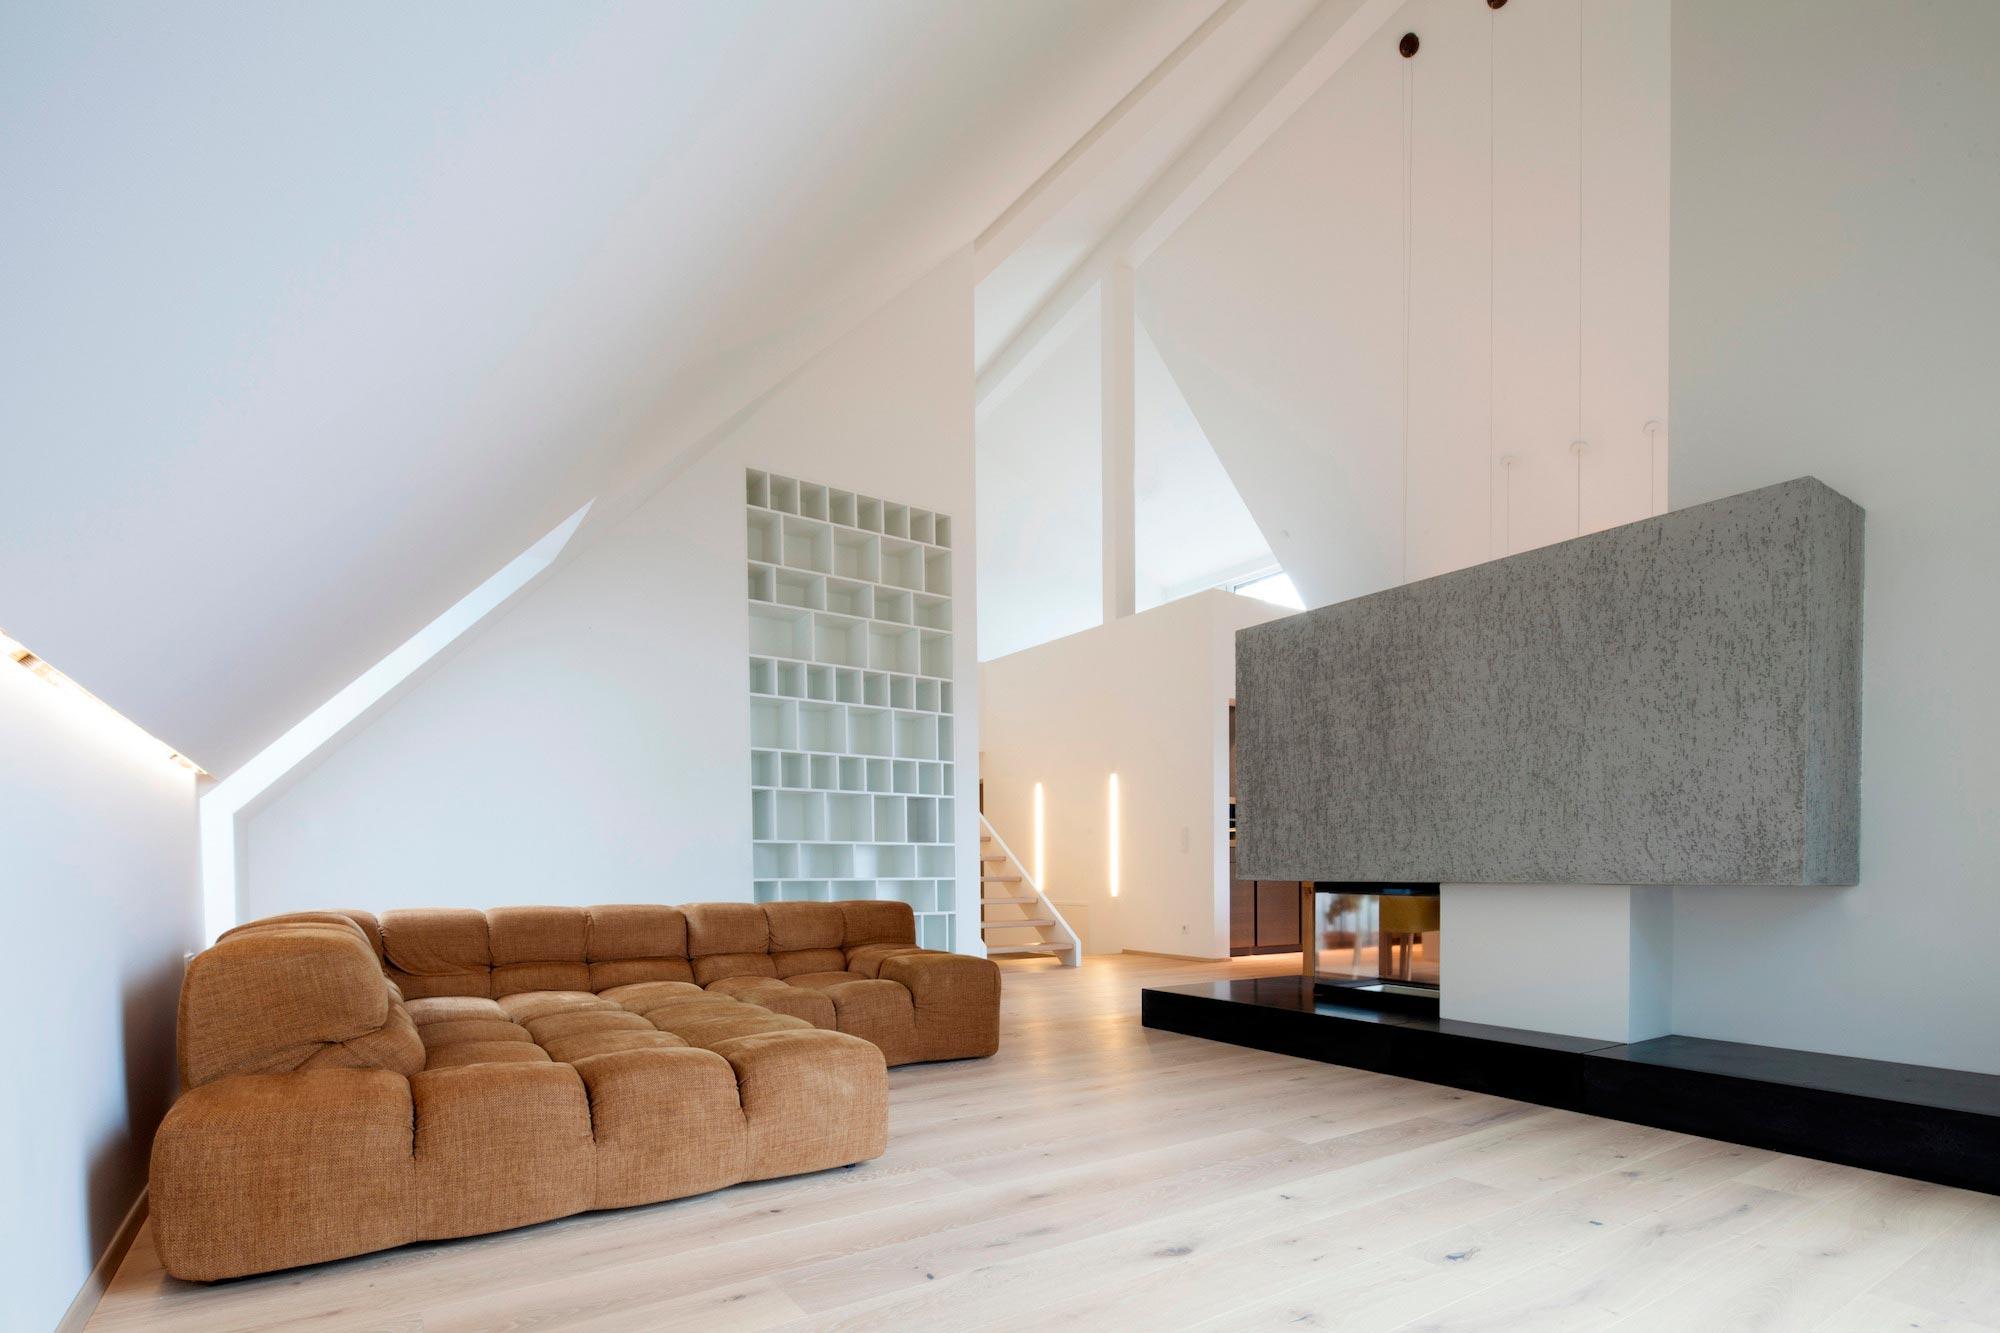 penthouse b in linz by destilat caandesign architecture and home design blog. Black Bedroom Furniture Sets. Home Design Ideas